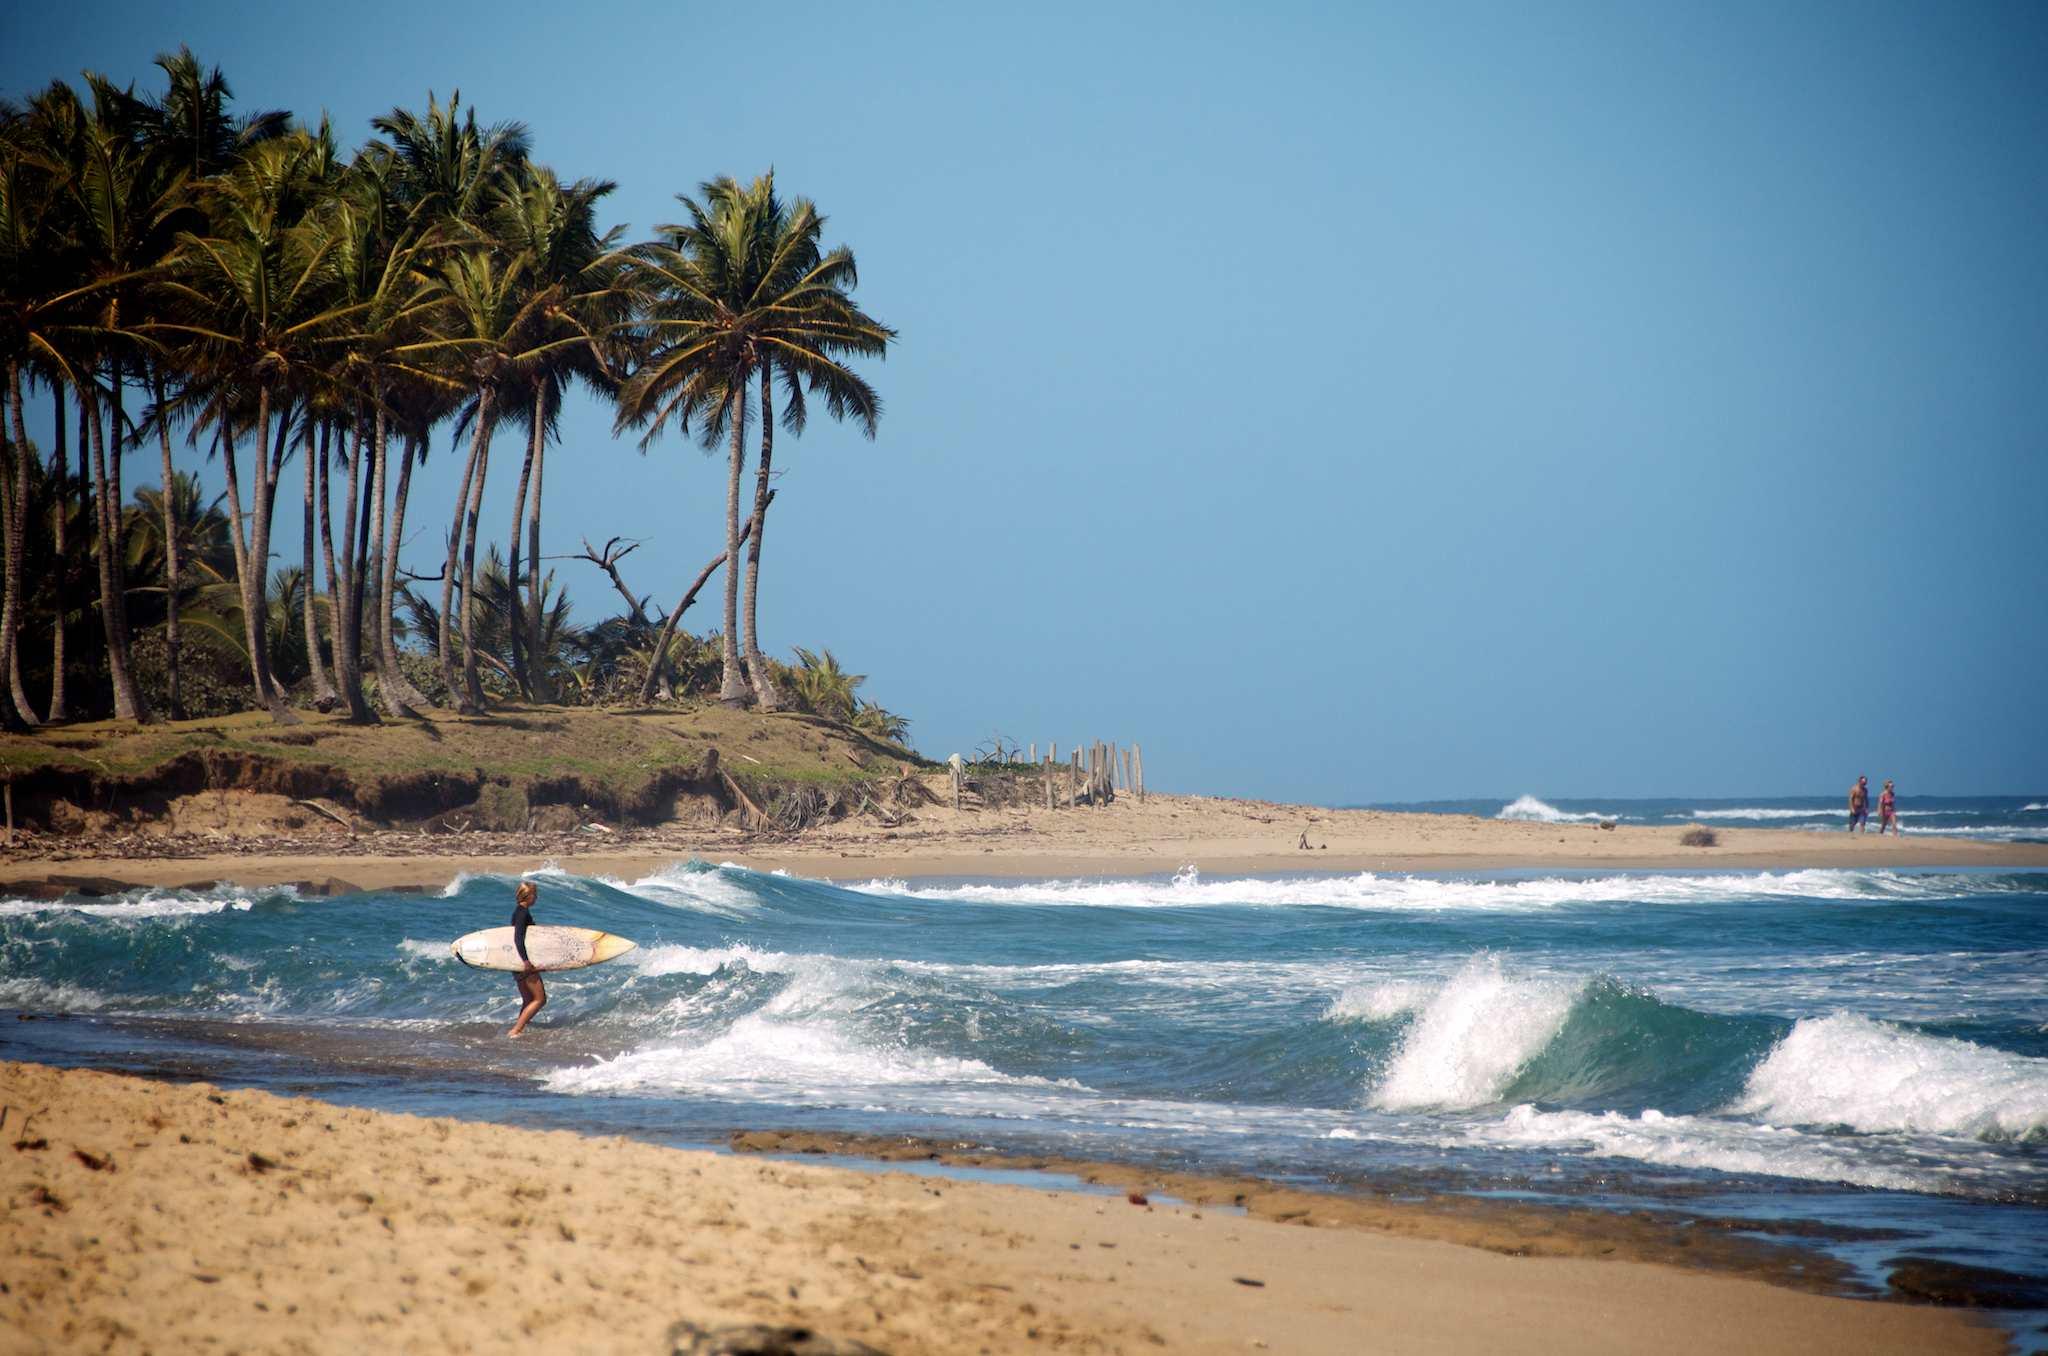 Photo Of The Day Surfing The North Shore Dominican Republic Dominican Republic